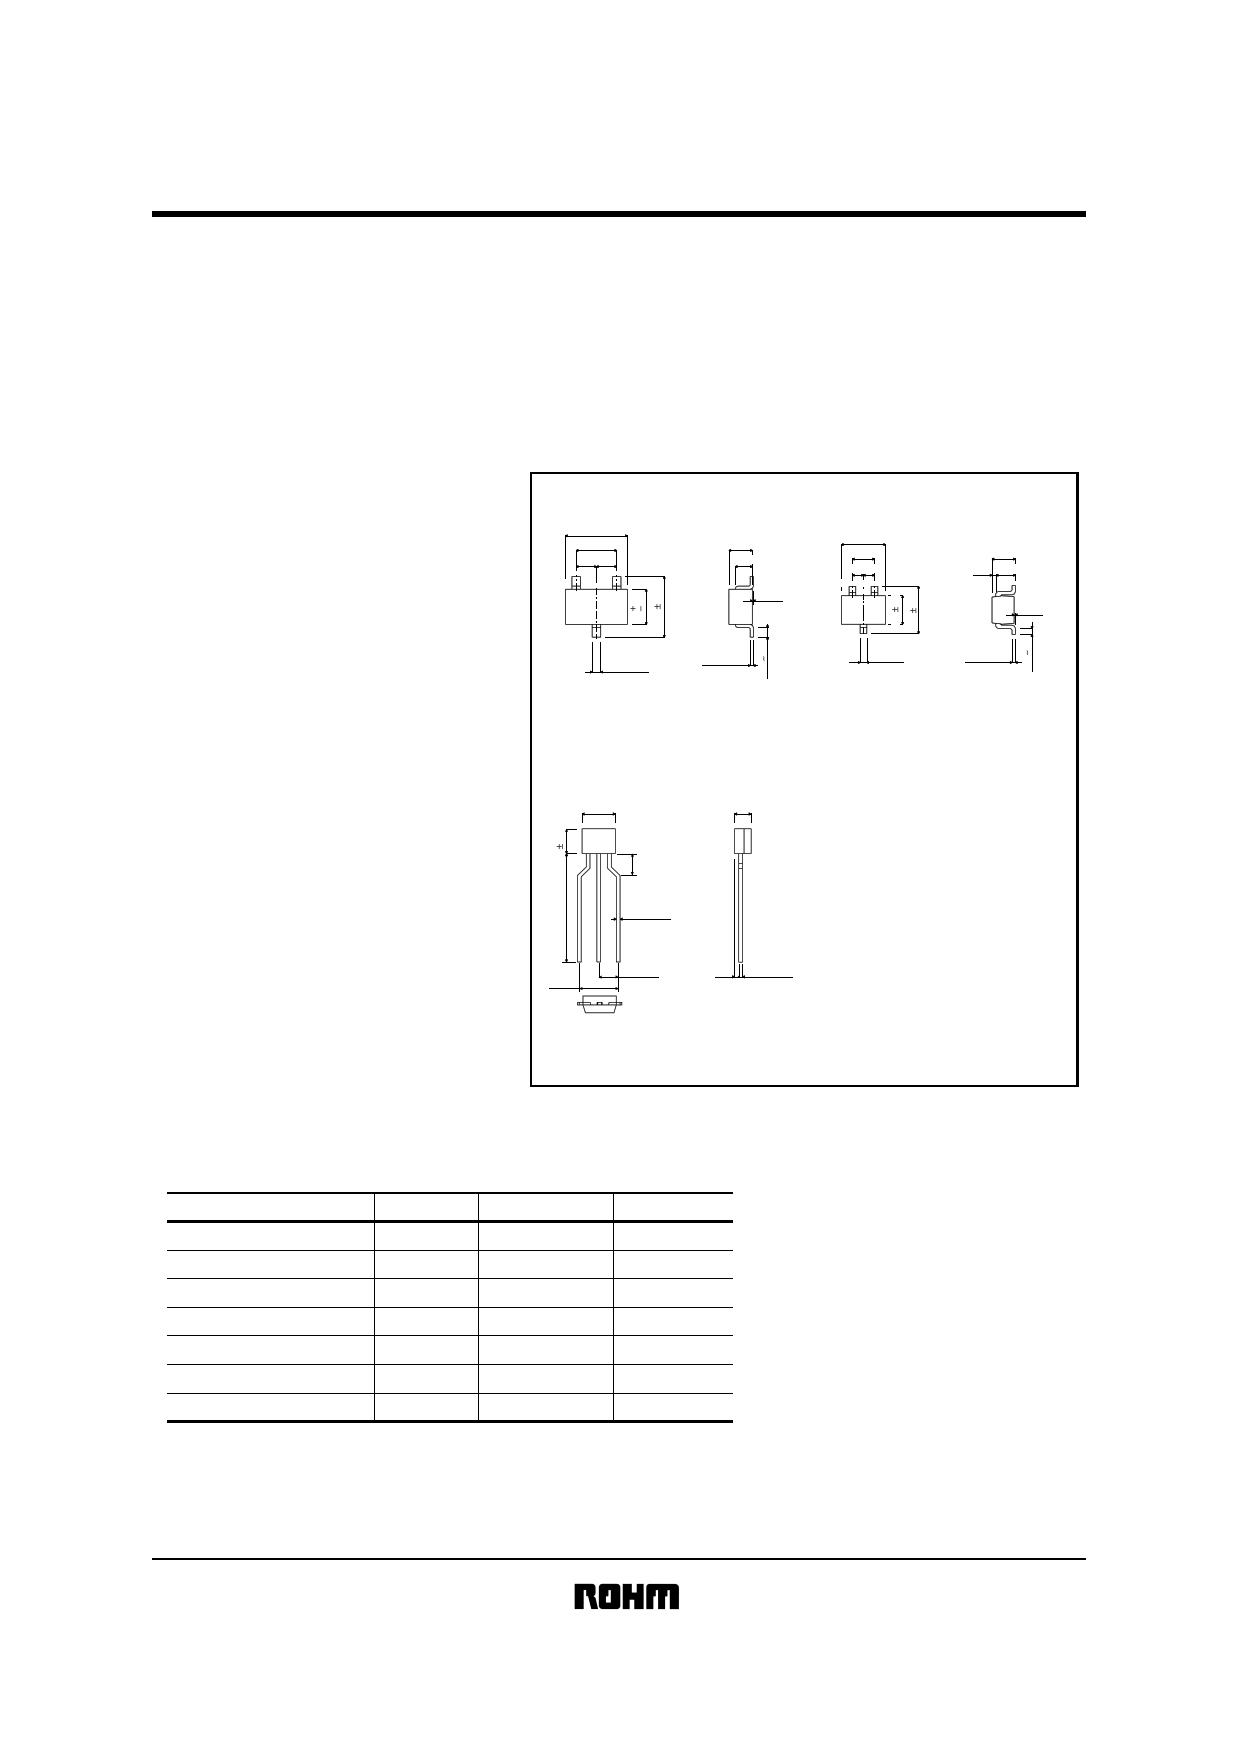 2SC1741S datasheet